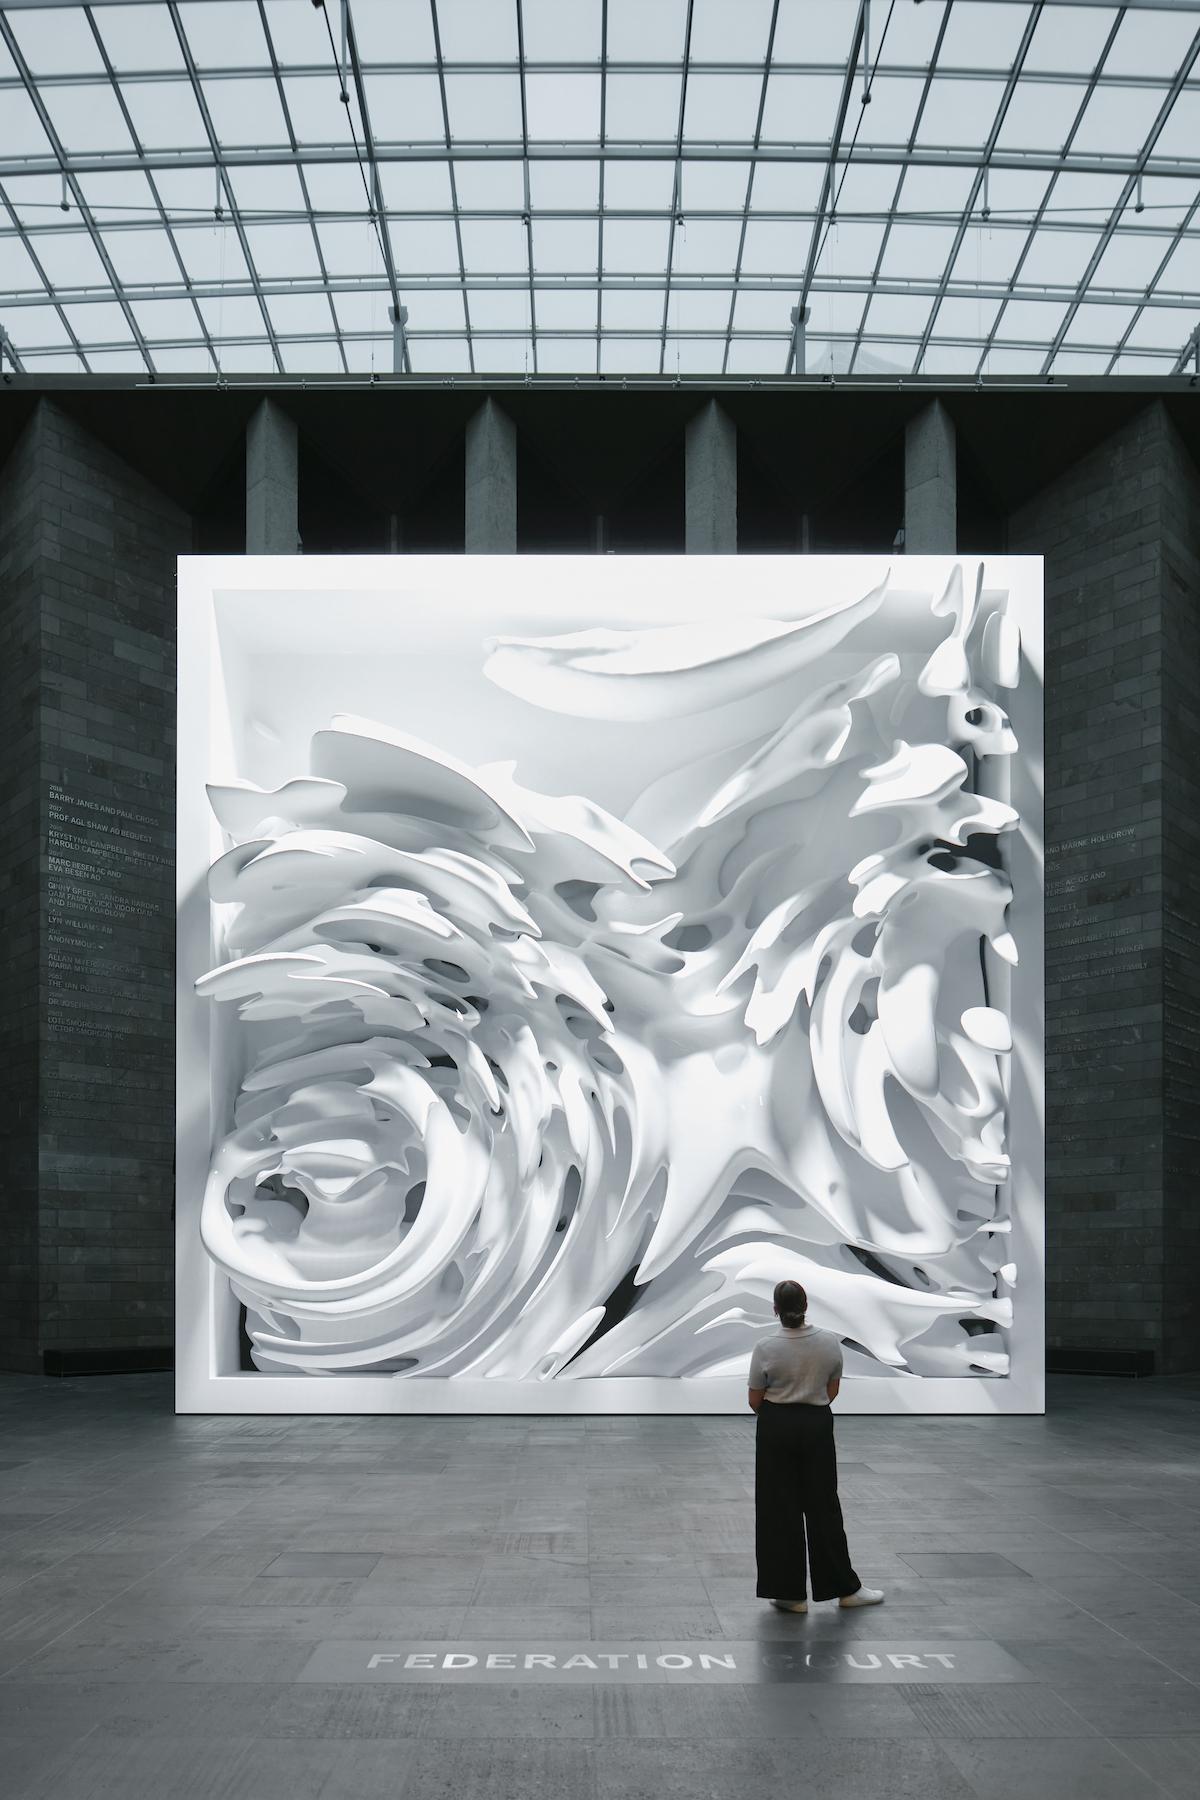 Digital Artist Refik Anadol Creates 'Quantum Memories' for the NGV Triennial